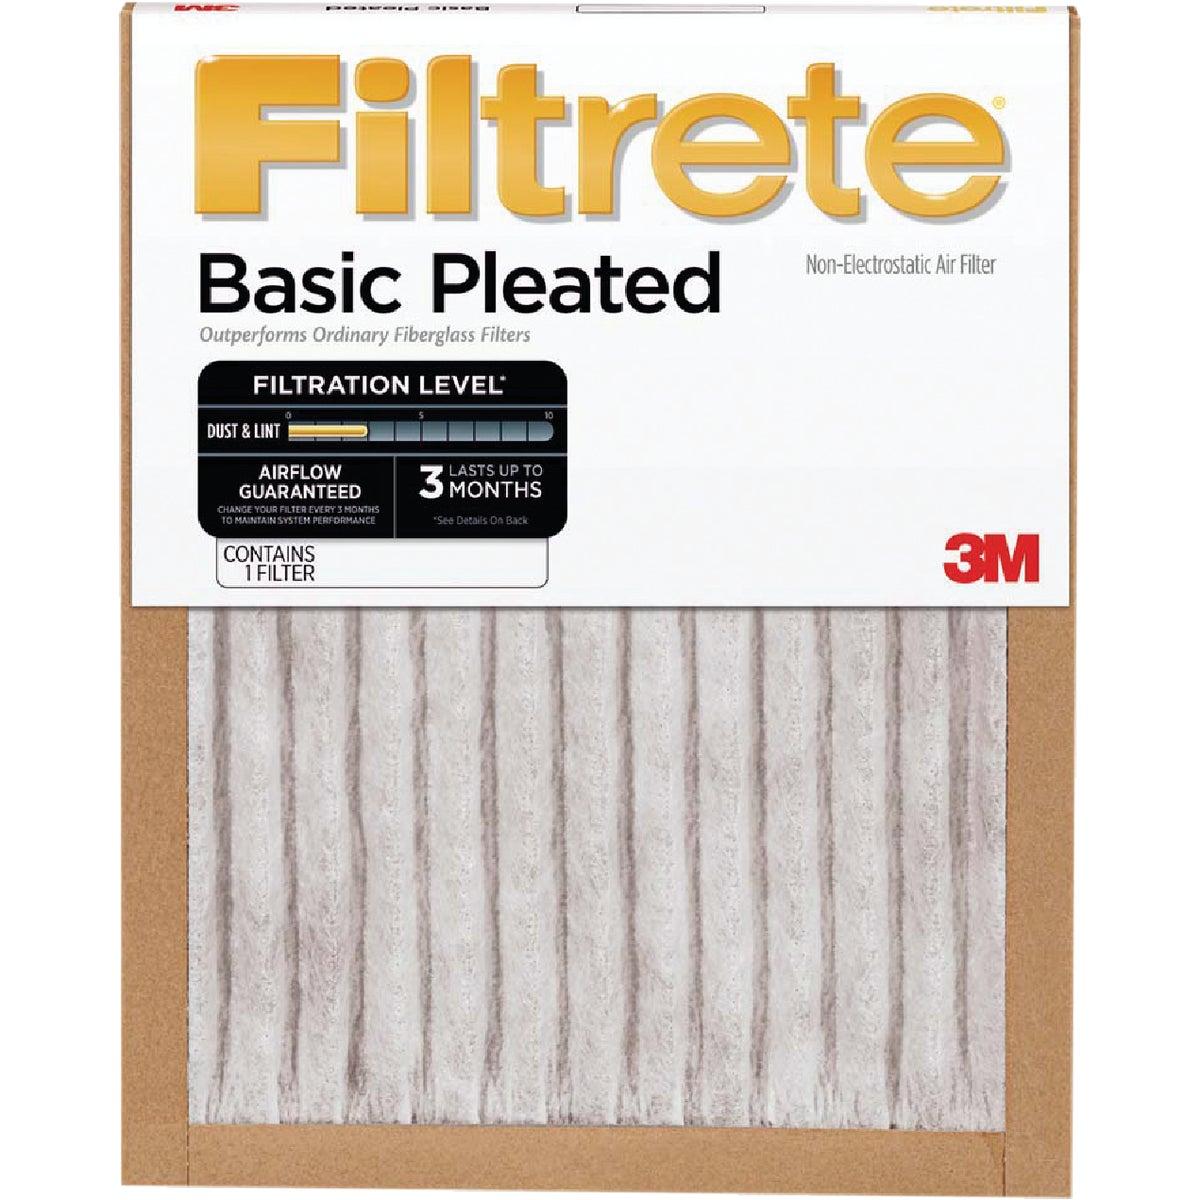 3M Filtrete 24 In. x 24 In. x 1 In. Basic Pleated 250 MPR Furnace Filter